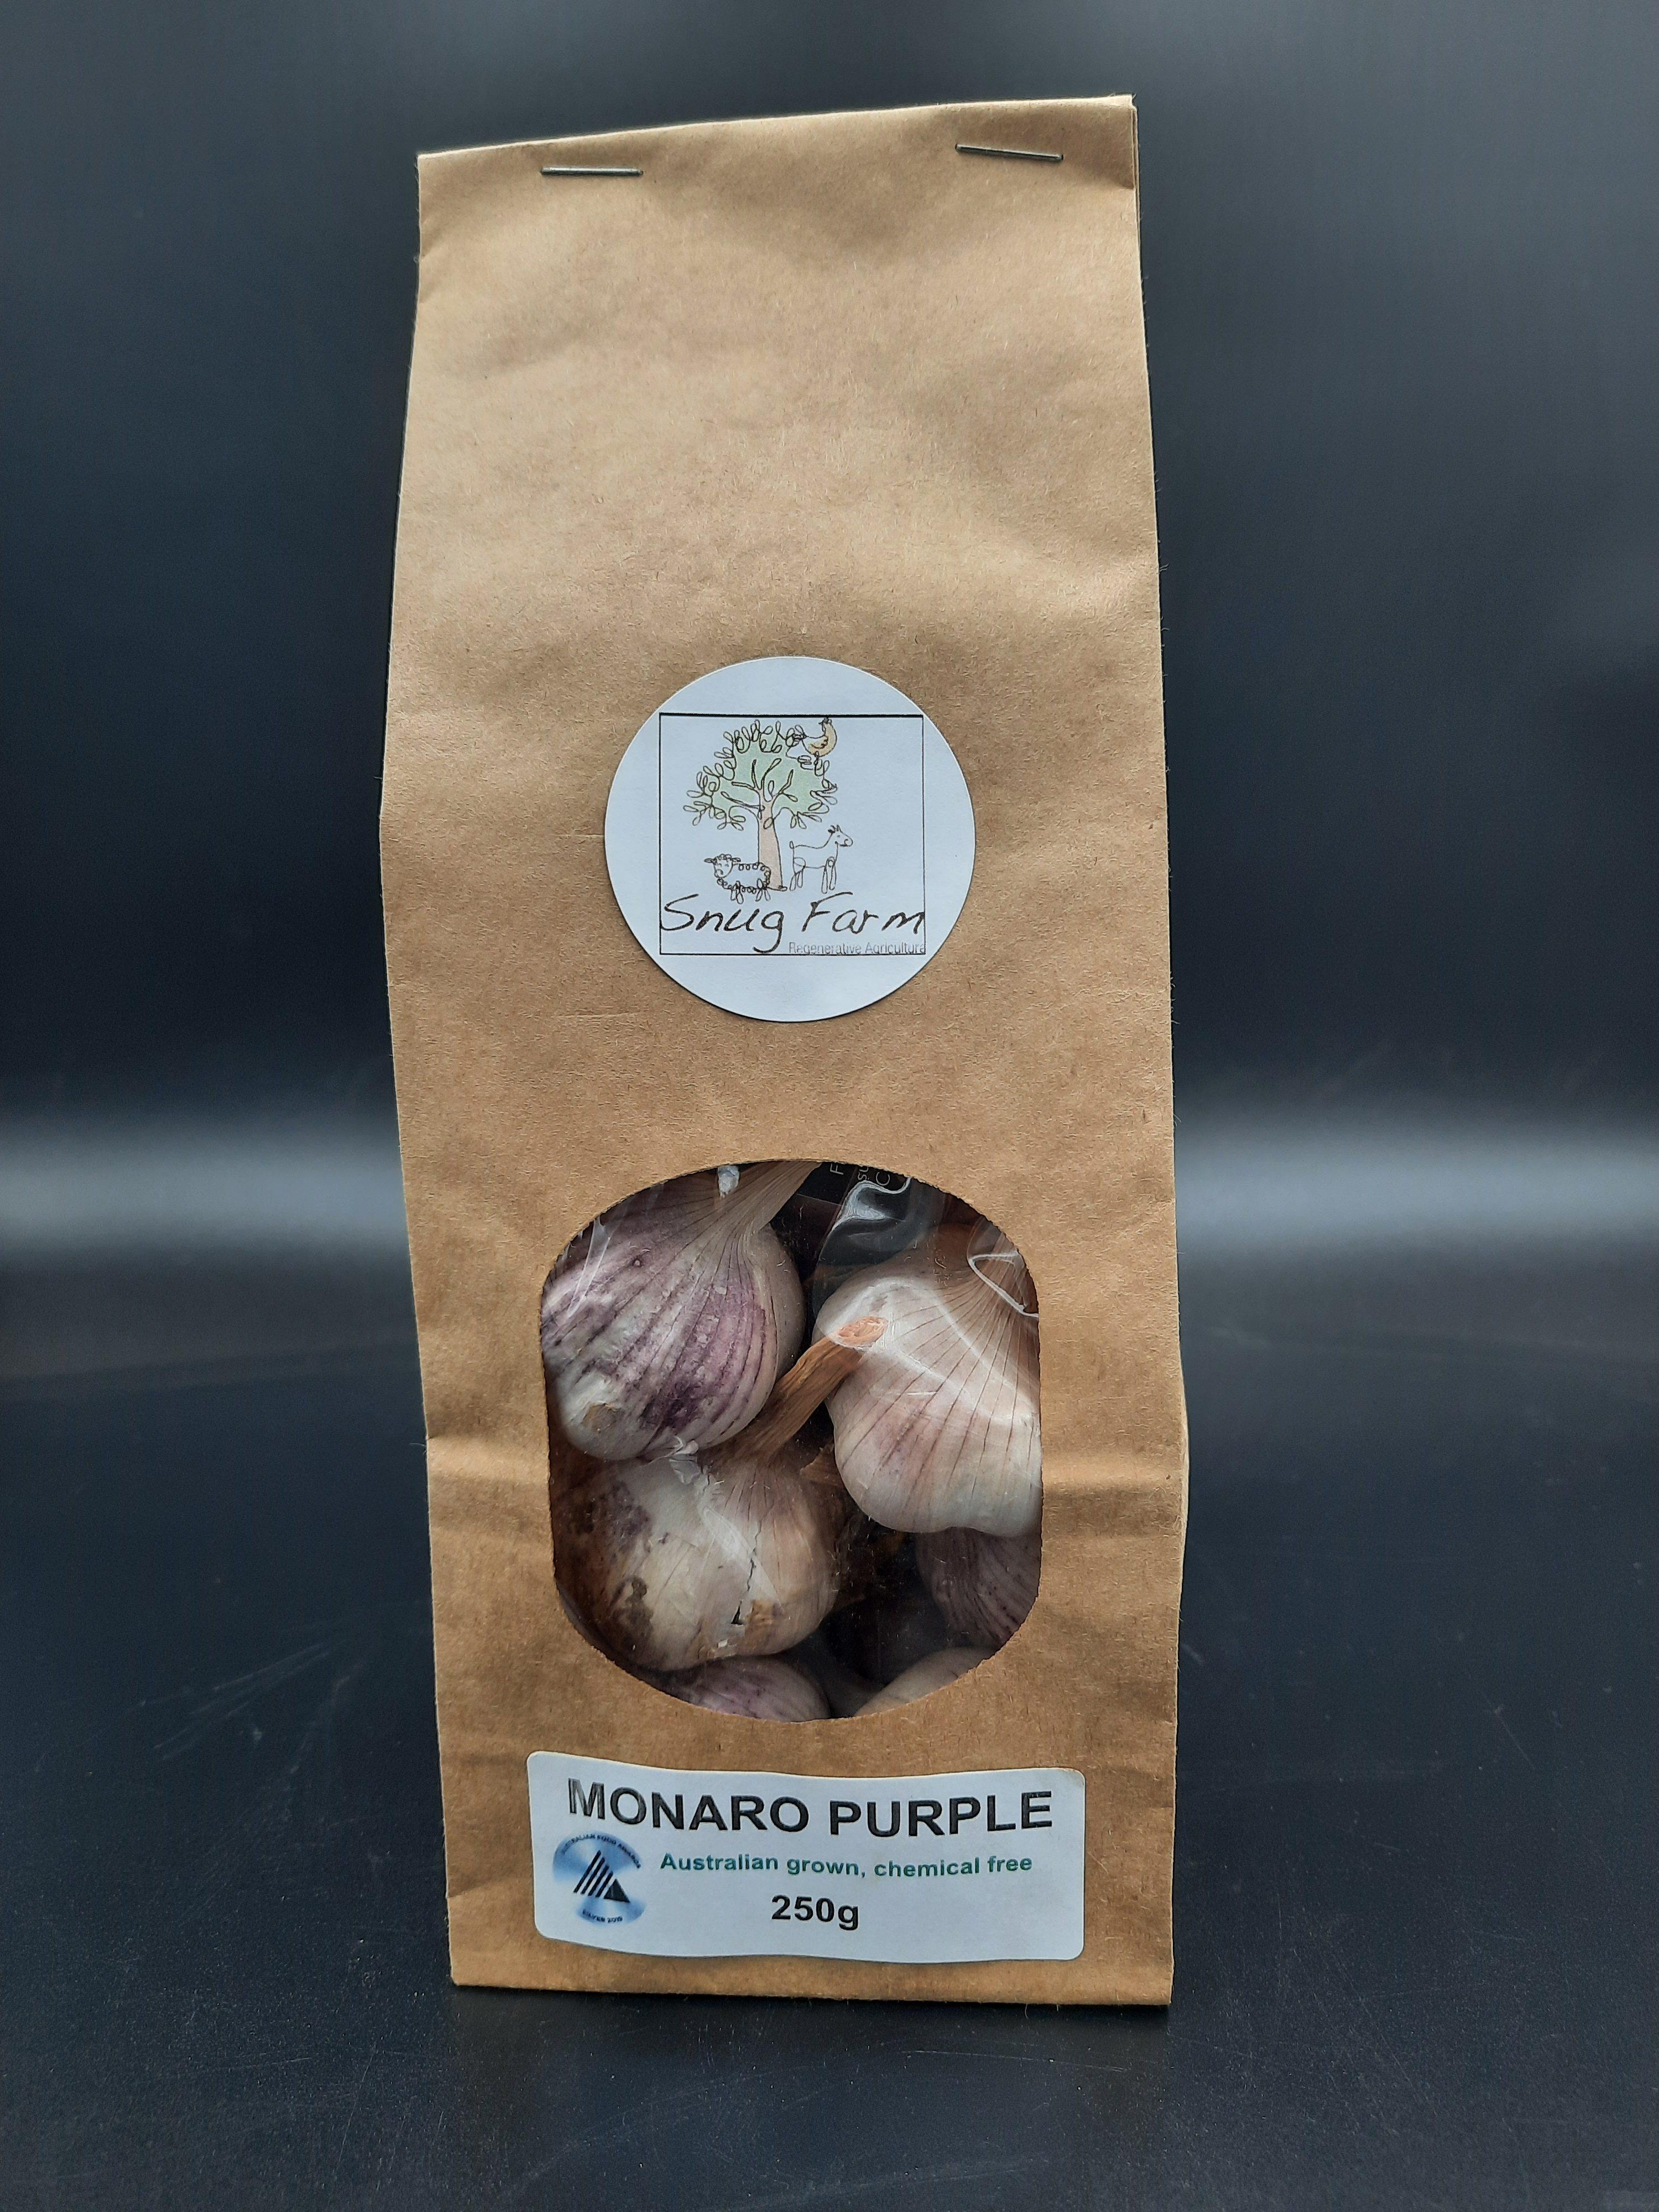 250g of chemical free Australian grown Monaro Purple garlic in biodegradable packaging